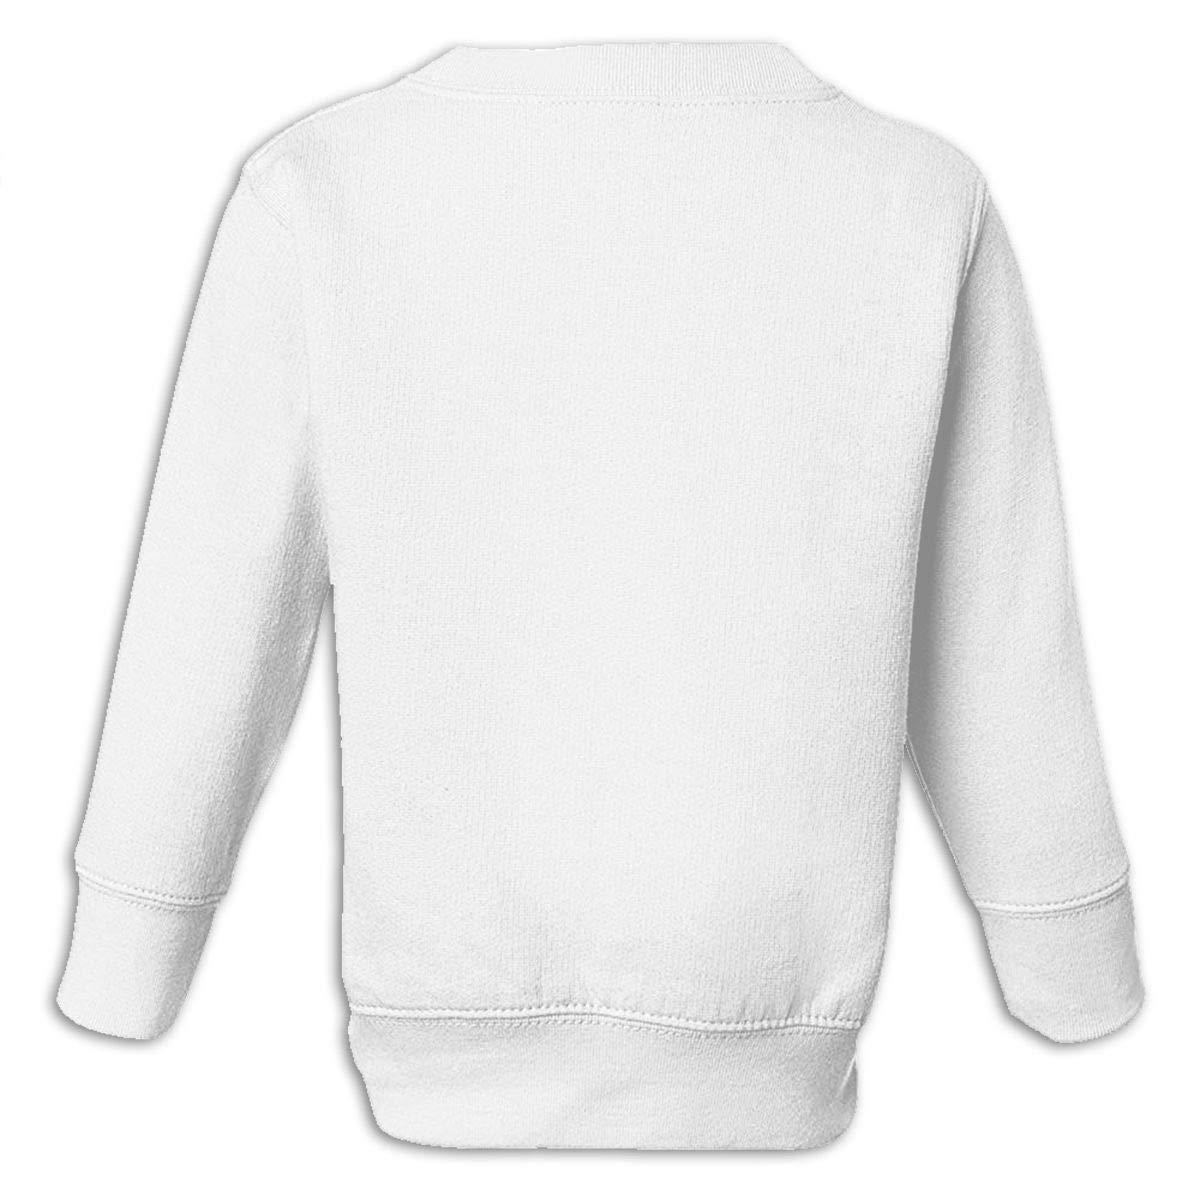 My Nana and Papa Love Me Baby Sweatshirt Fashion Toddler Hoodies Comfortable Sweaters